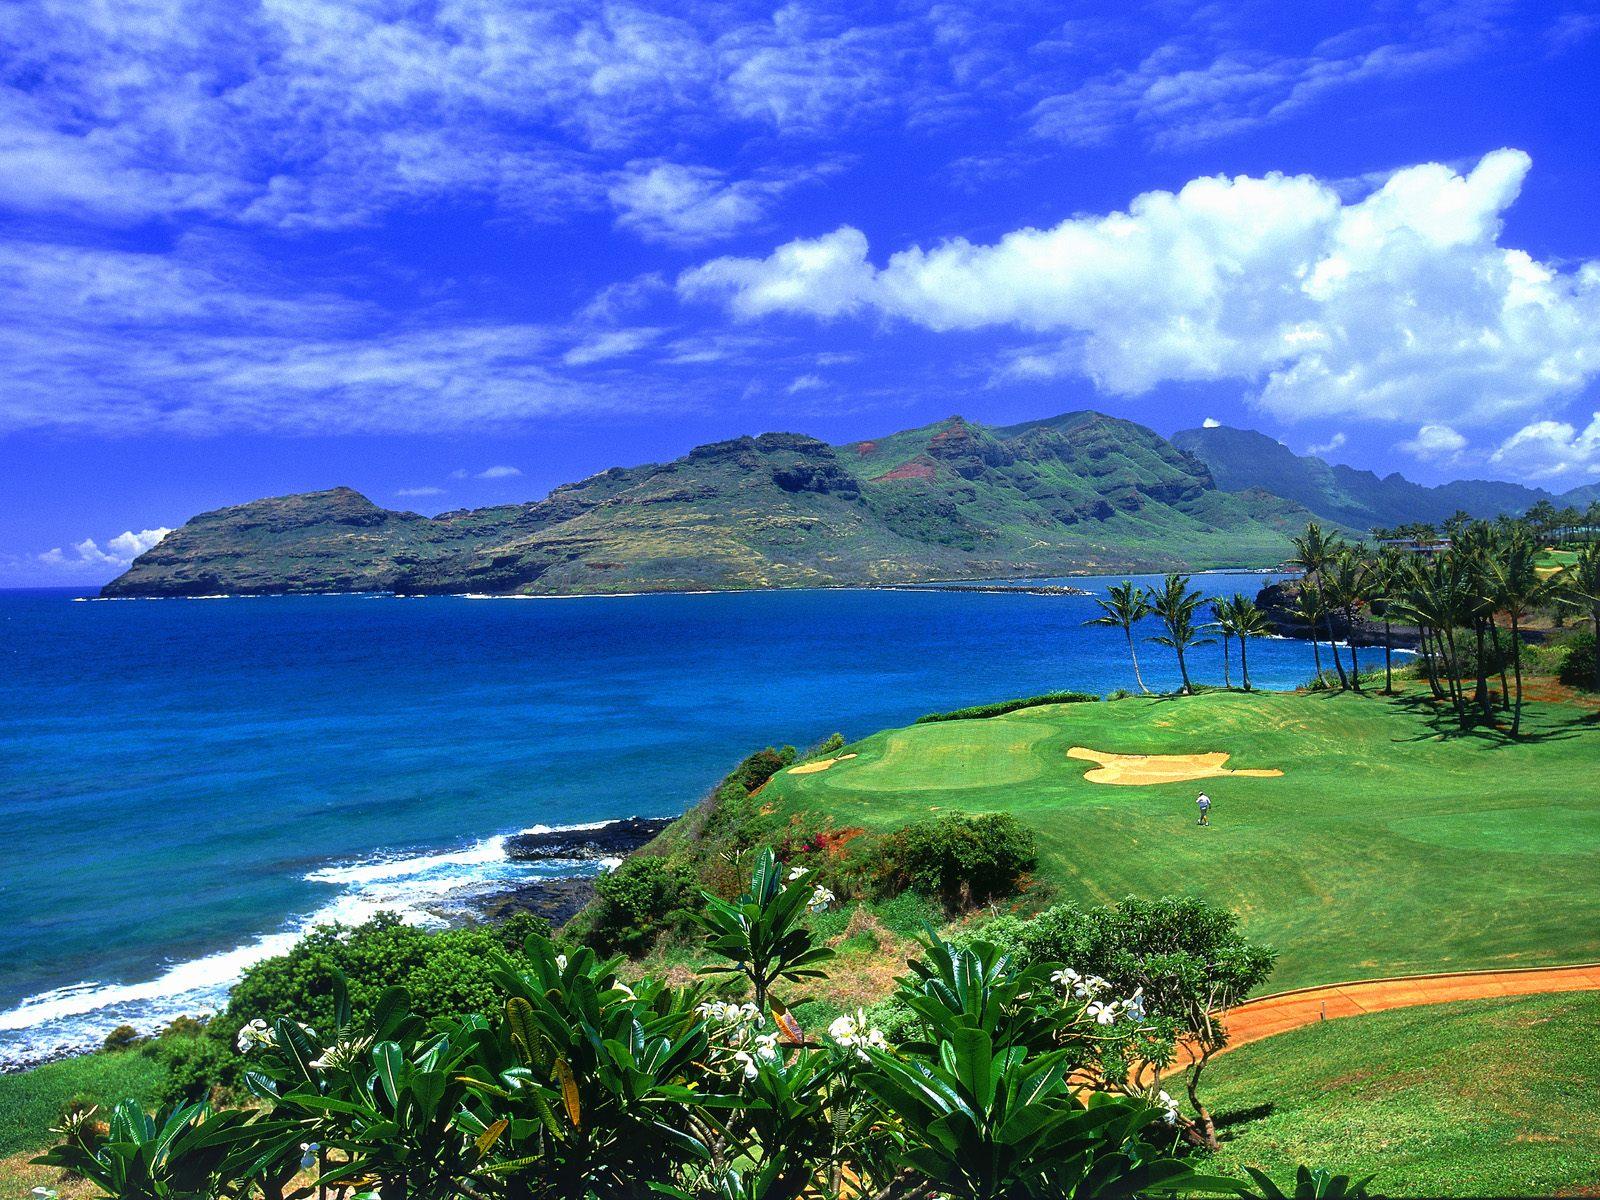 Golf Hawaii Wallpapers HD Wallpapers 1600x1200